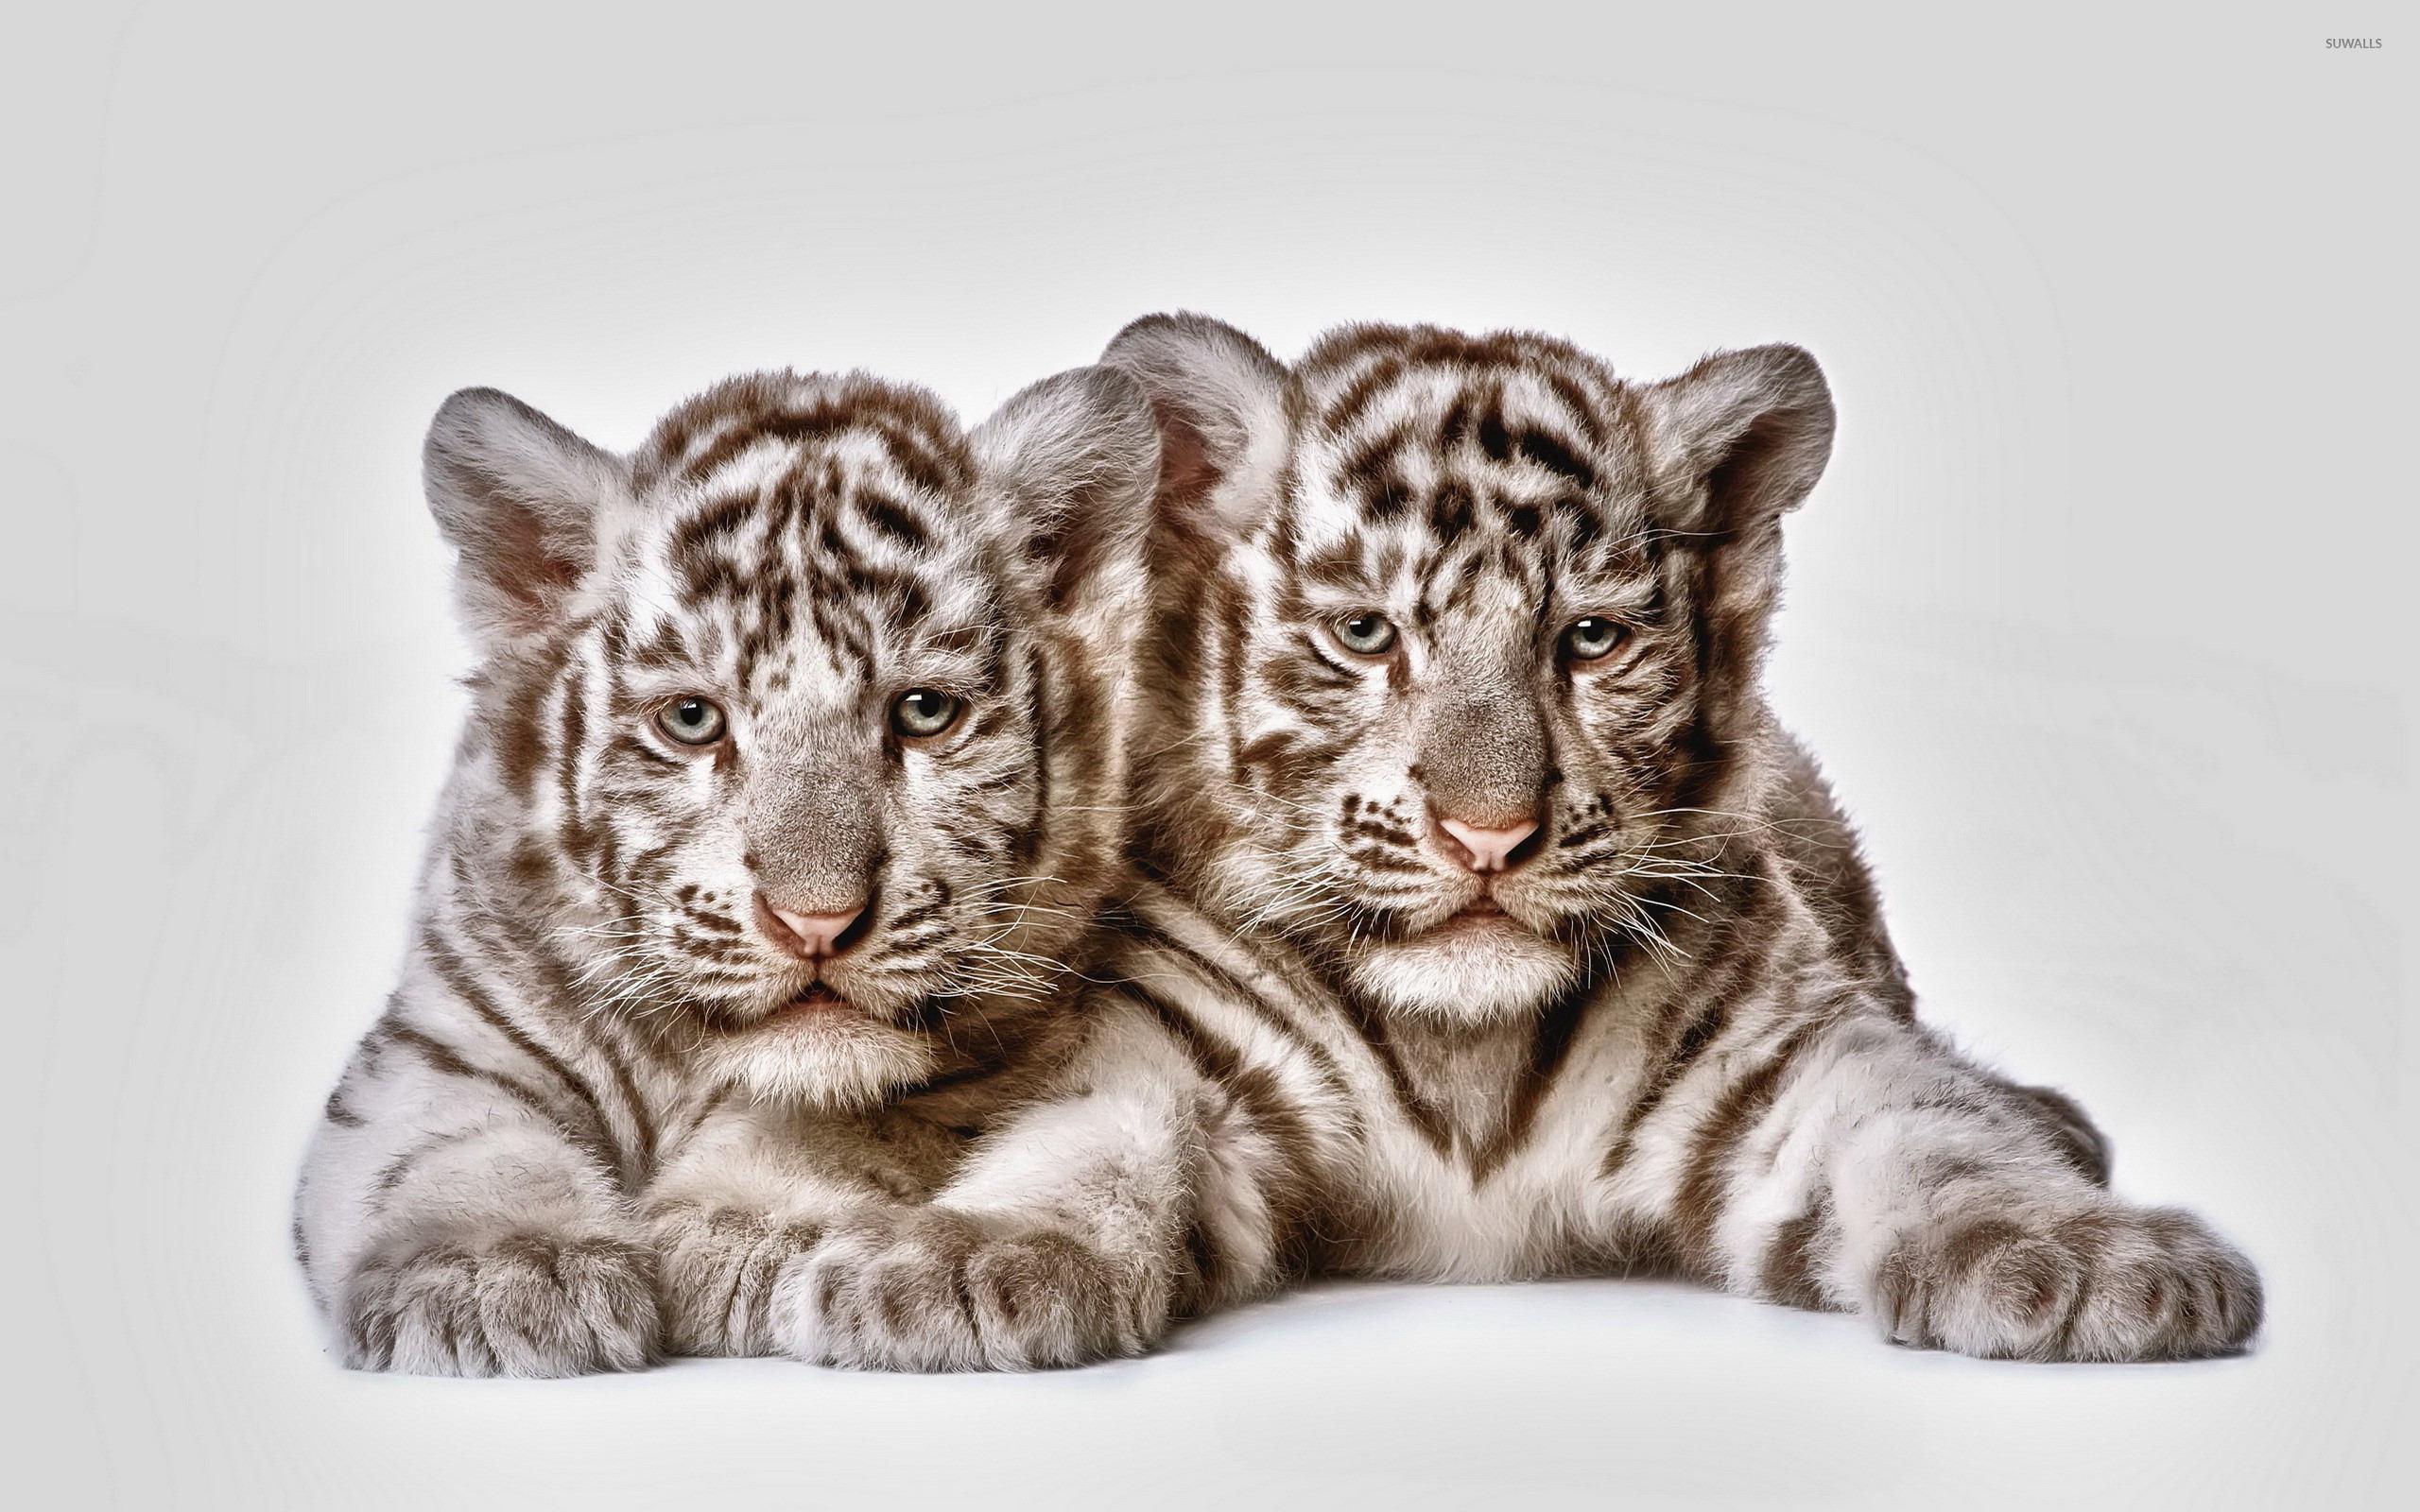 tiger cubs wallpaper - animal wallpapers - #17832